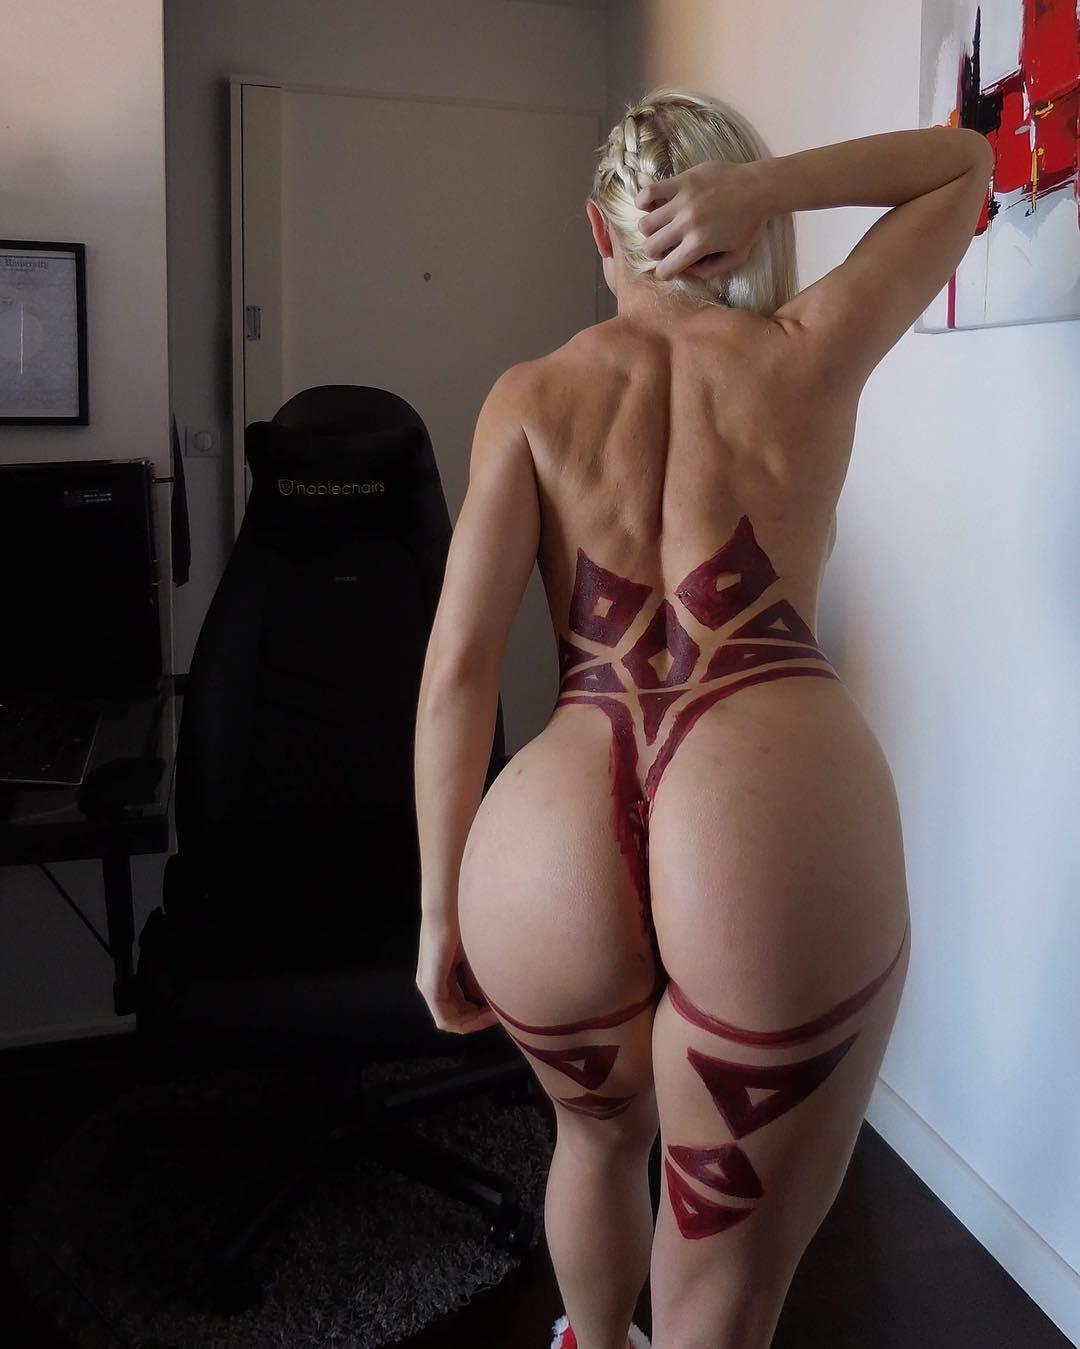 Hailey harber nude